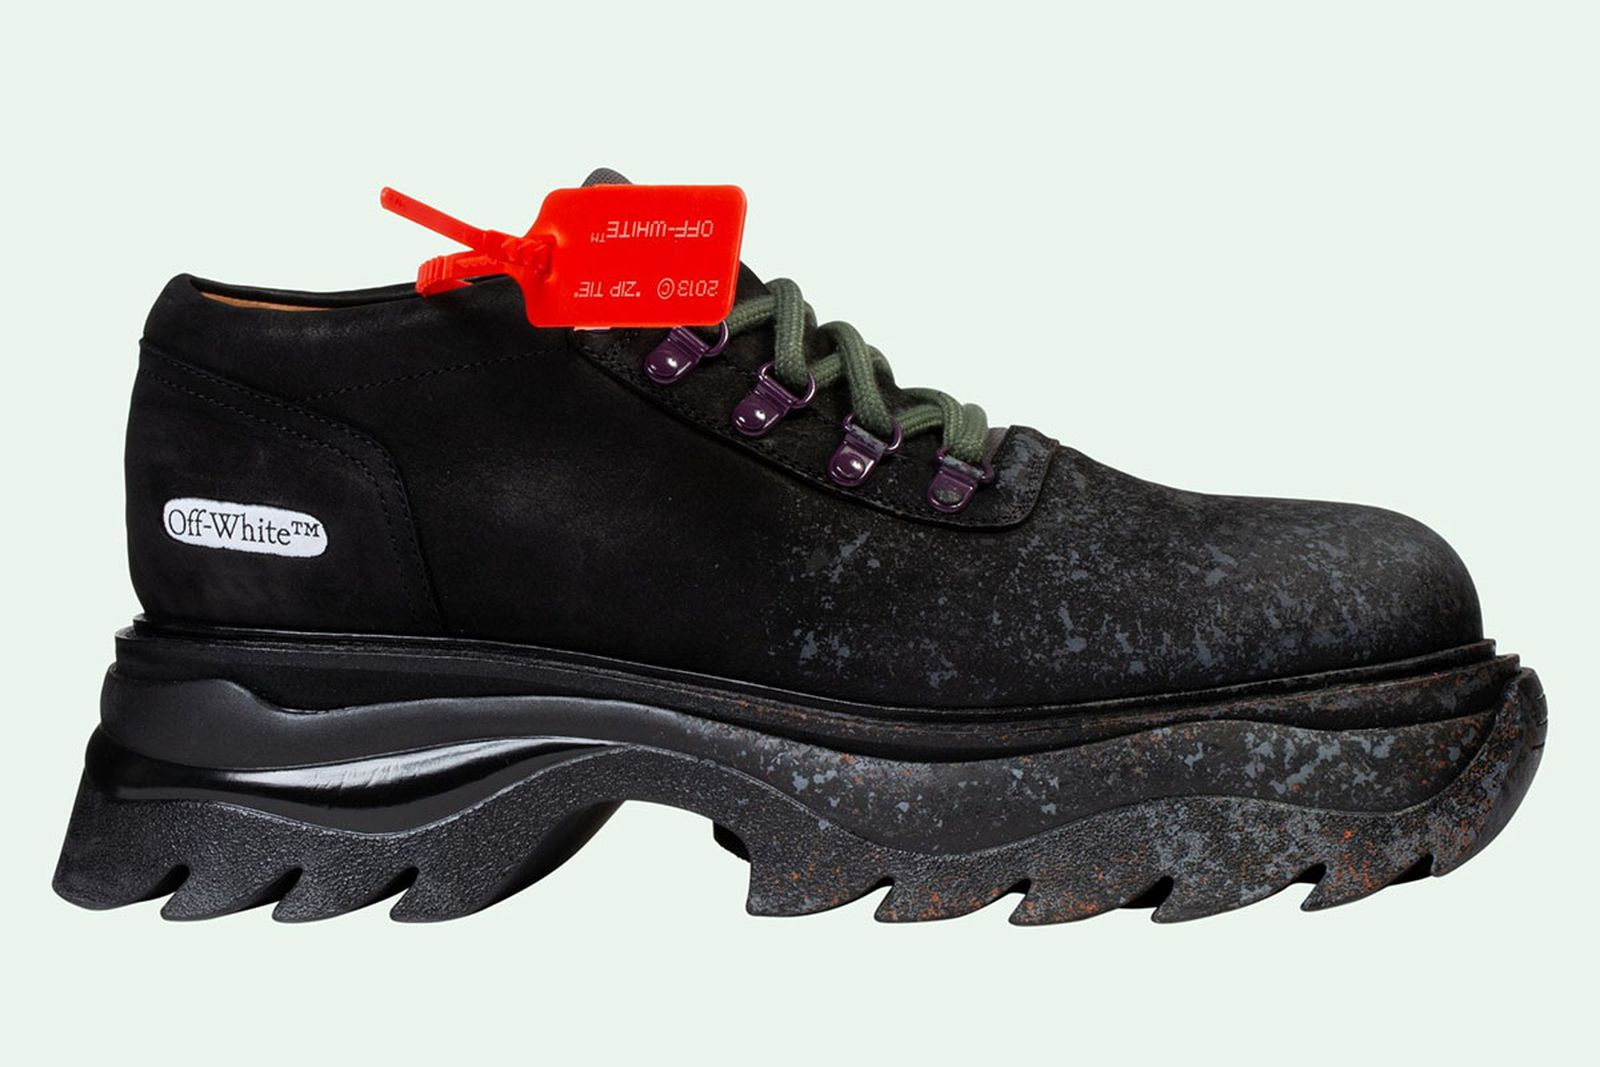 off-white-ridged-sole-sneaker-release-date-price-02